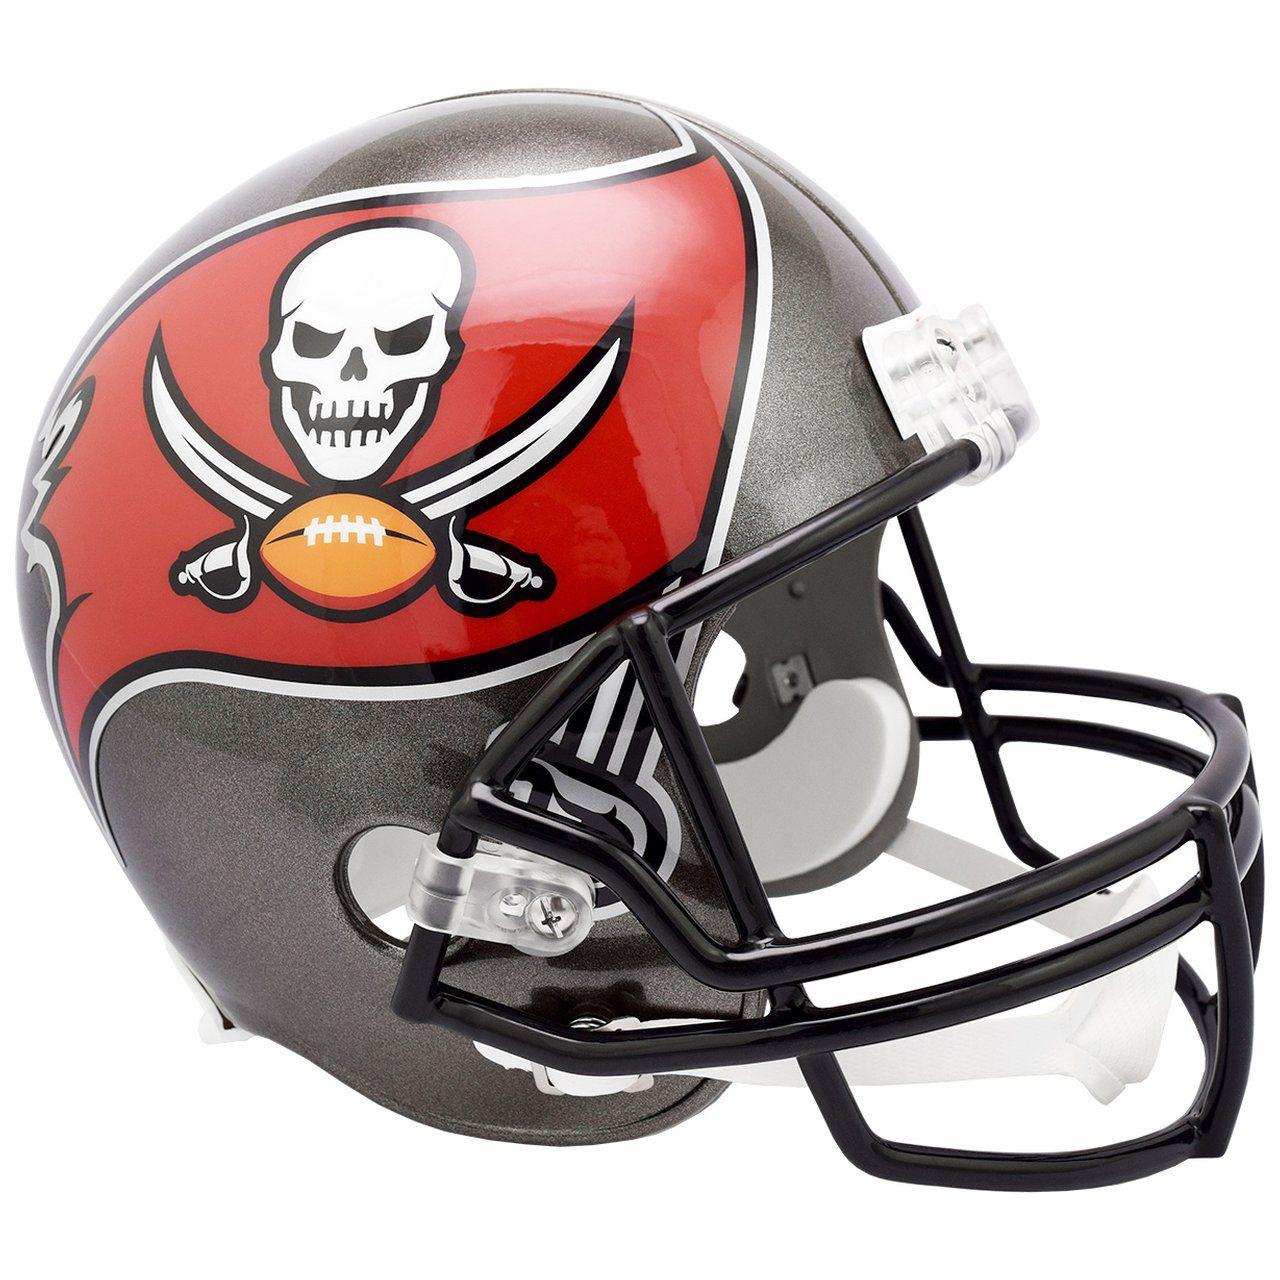 amfoo - Riddell VSR4 Replica Football Helm - Tampa Bay Buccaneers